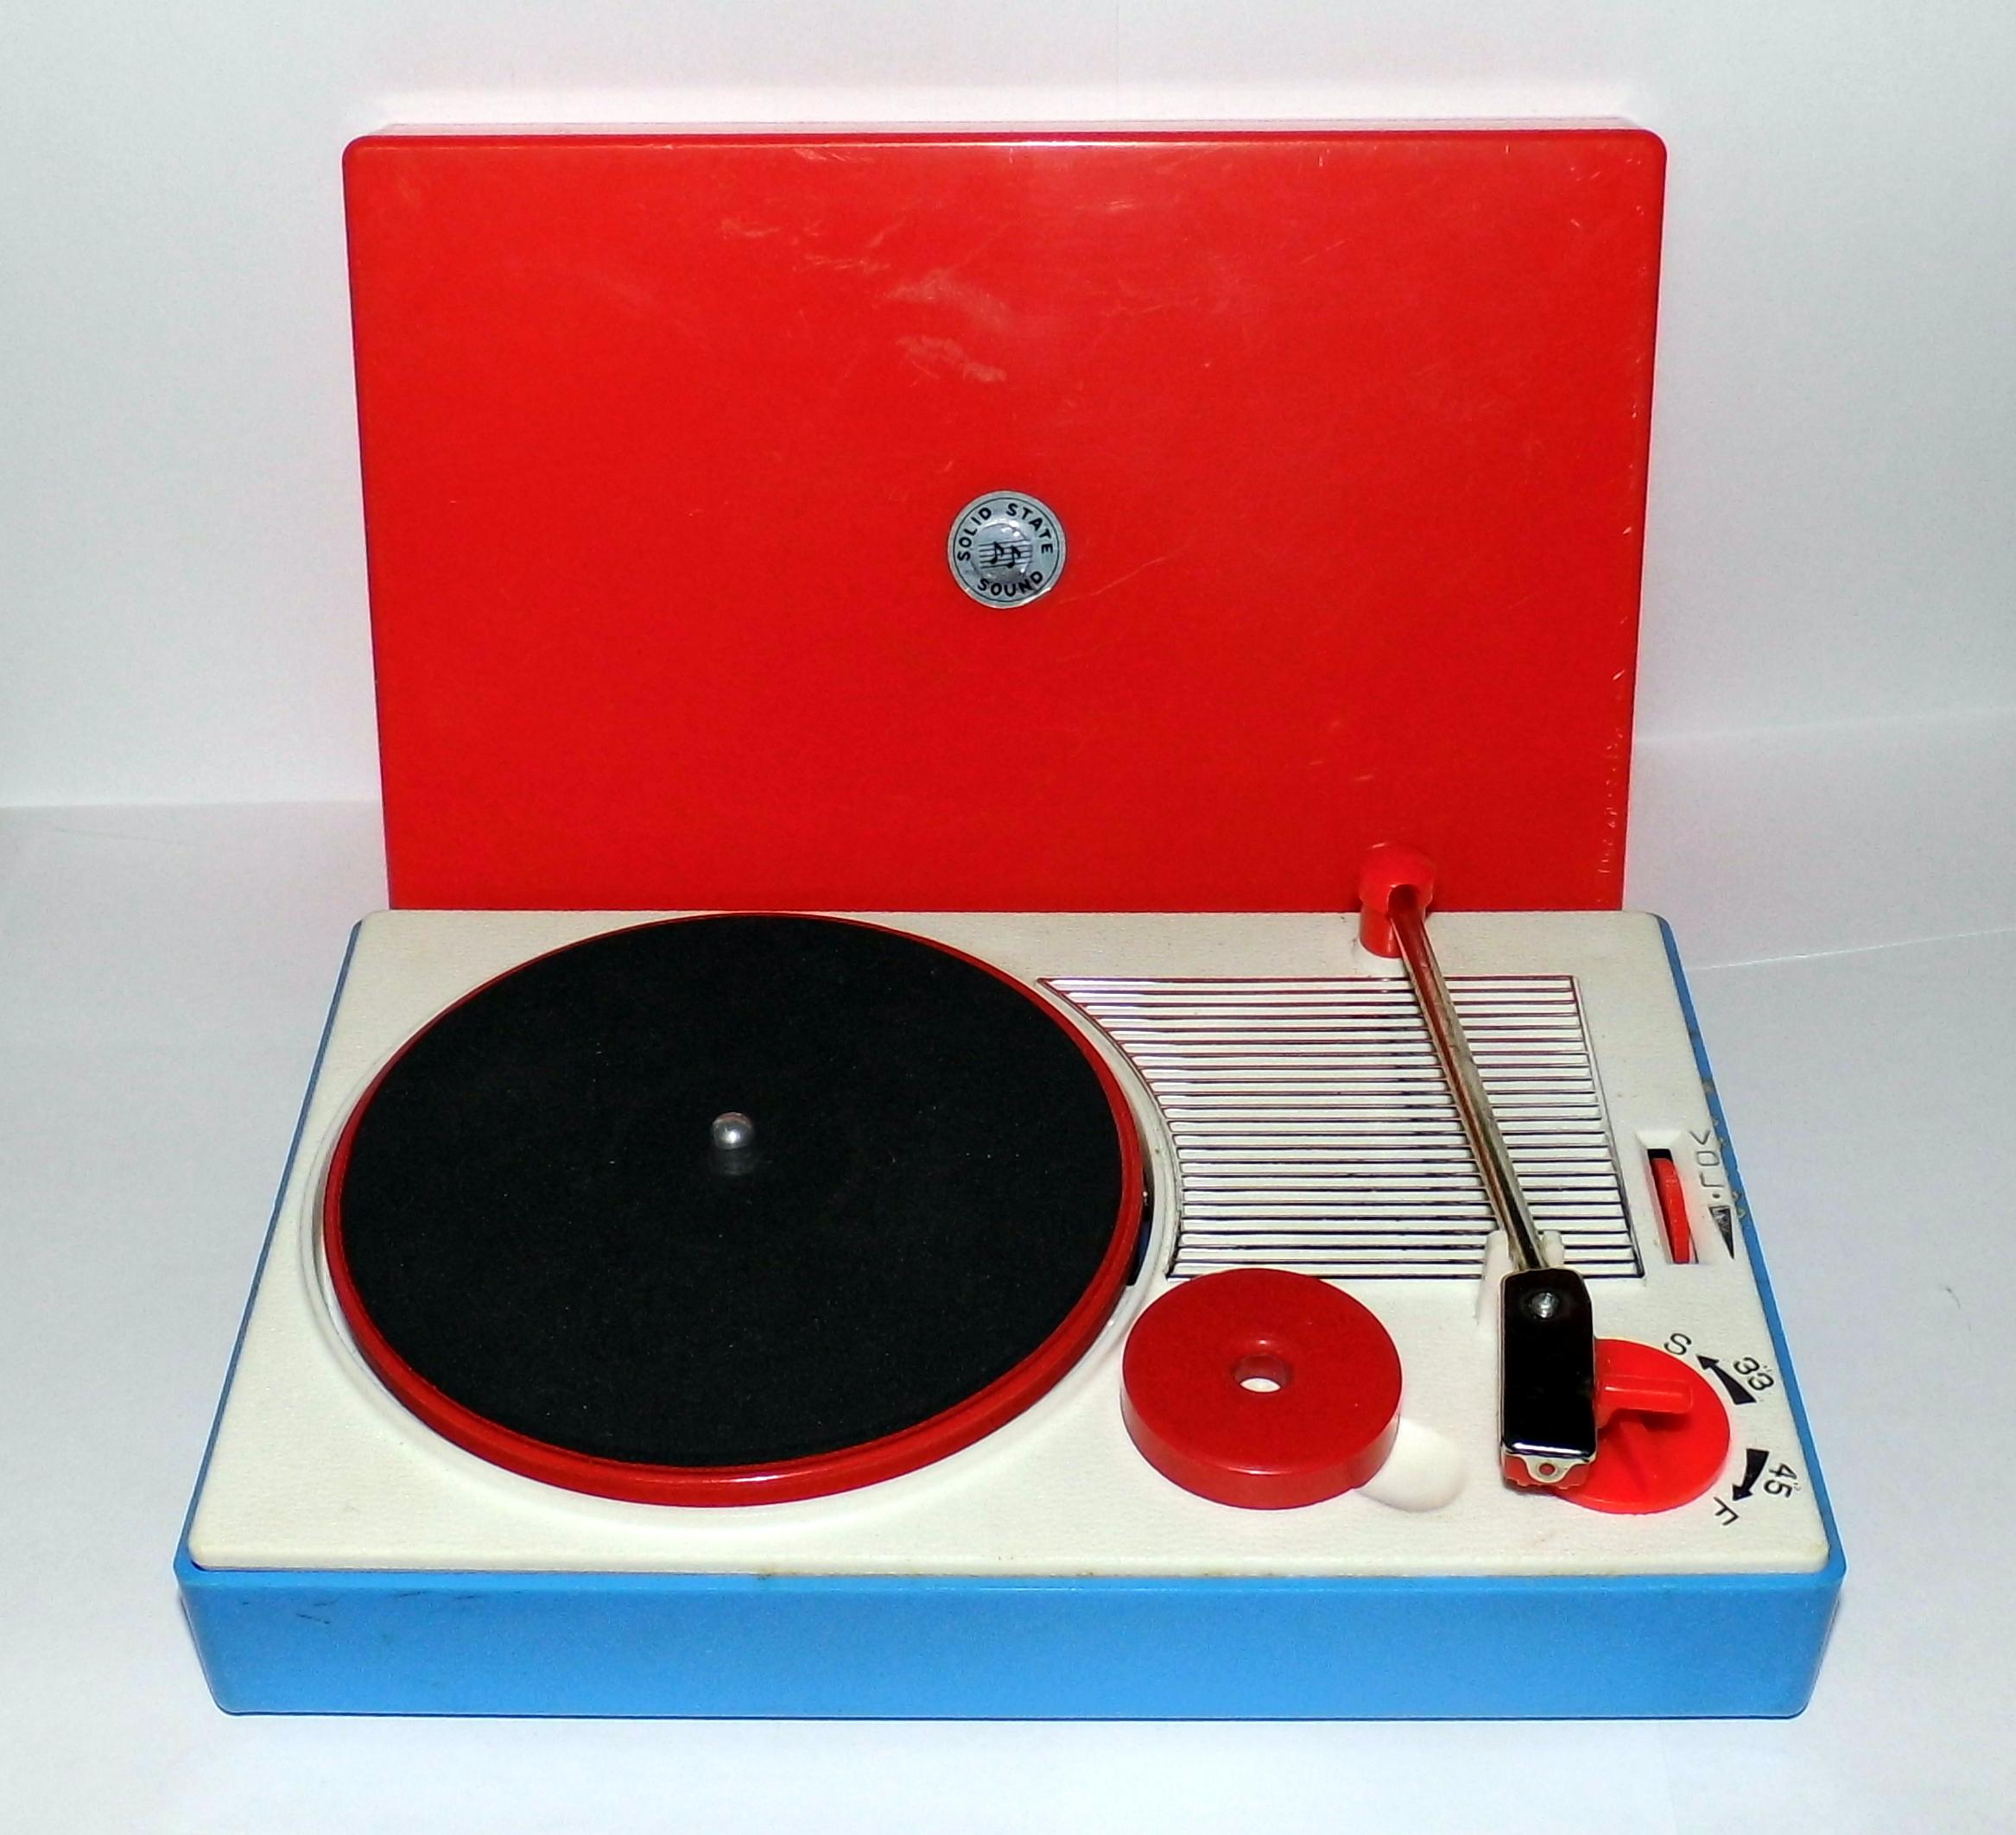 vintage delmonico nivico transistorized phonograph model tph 27 4